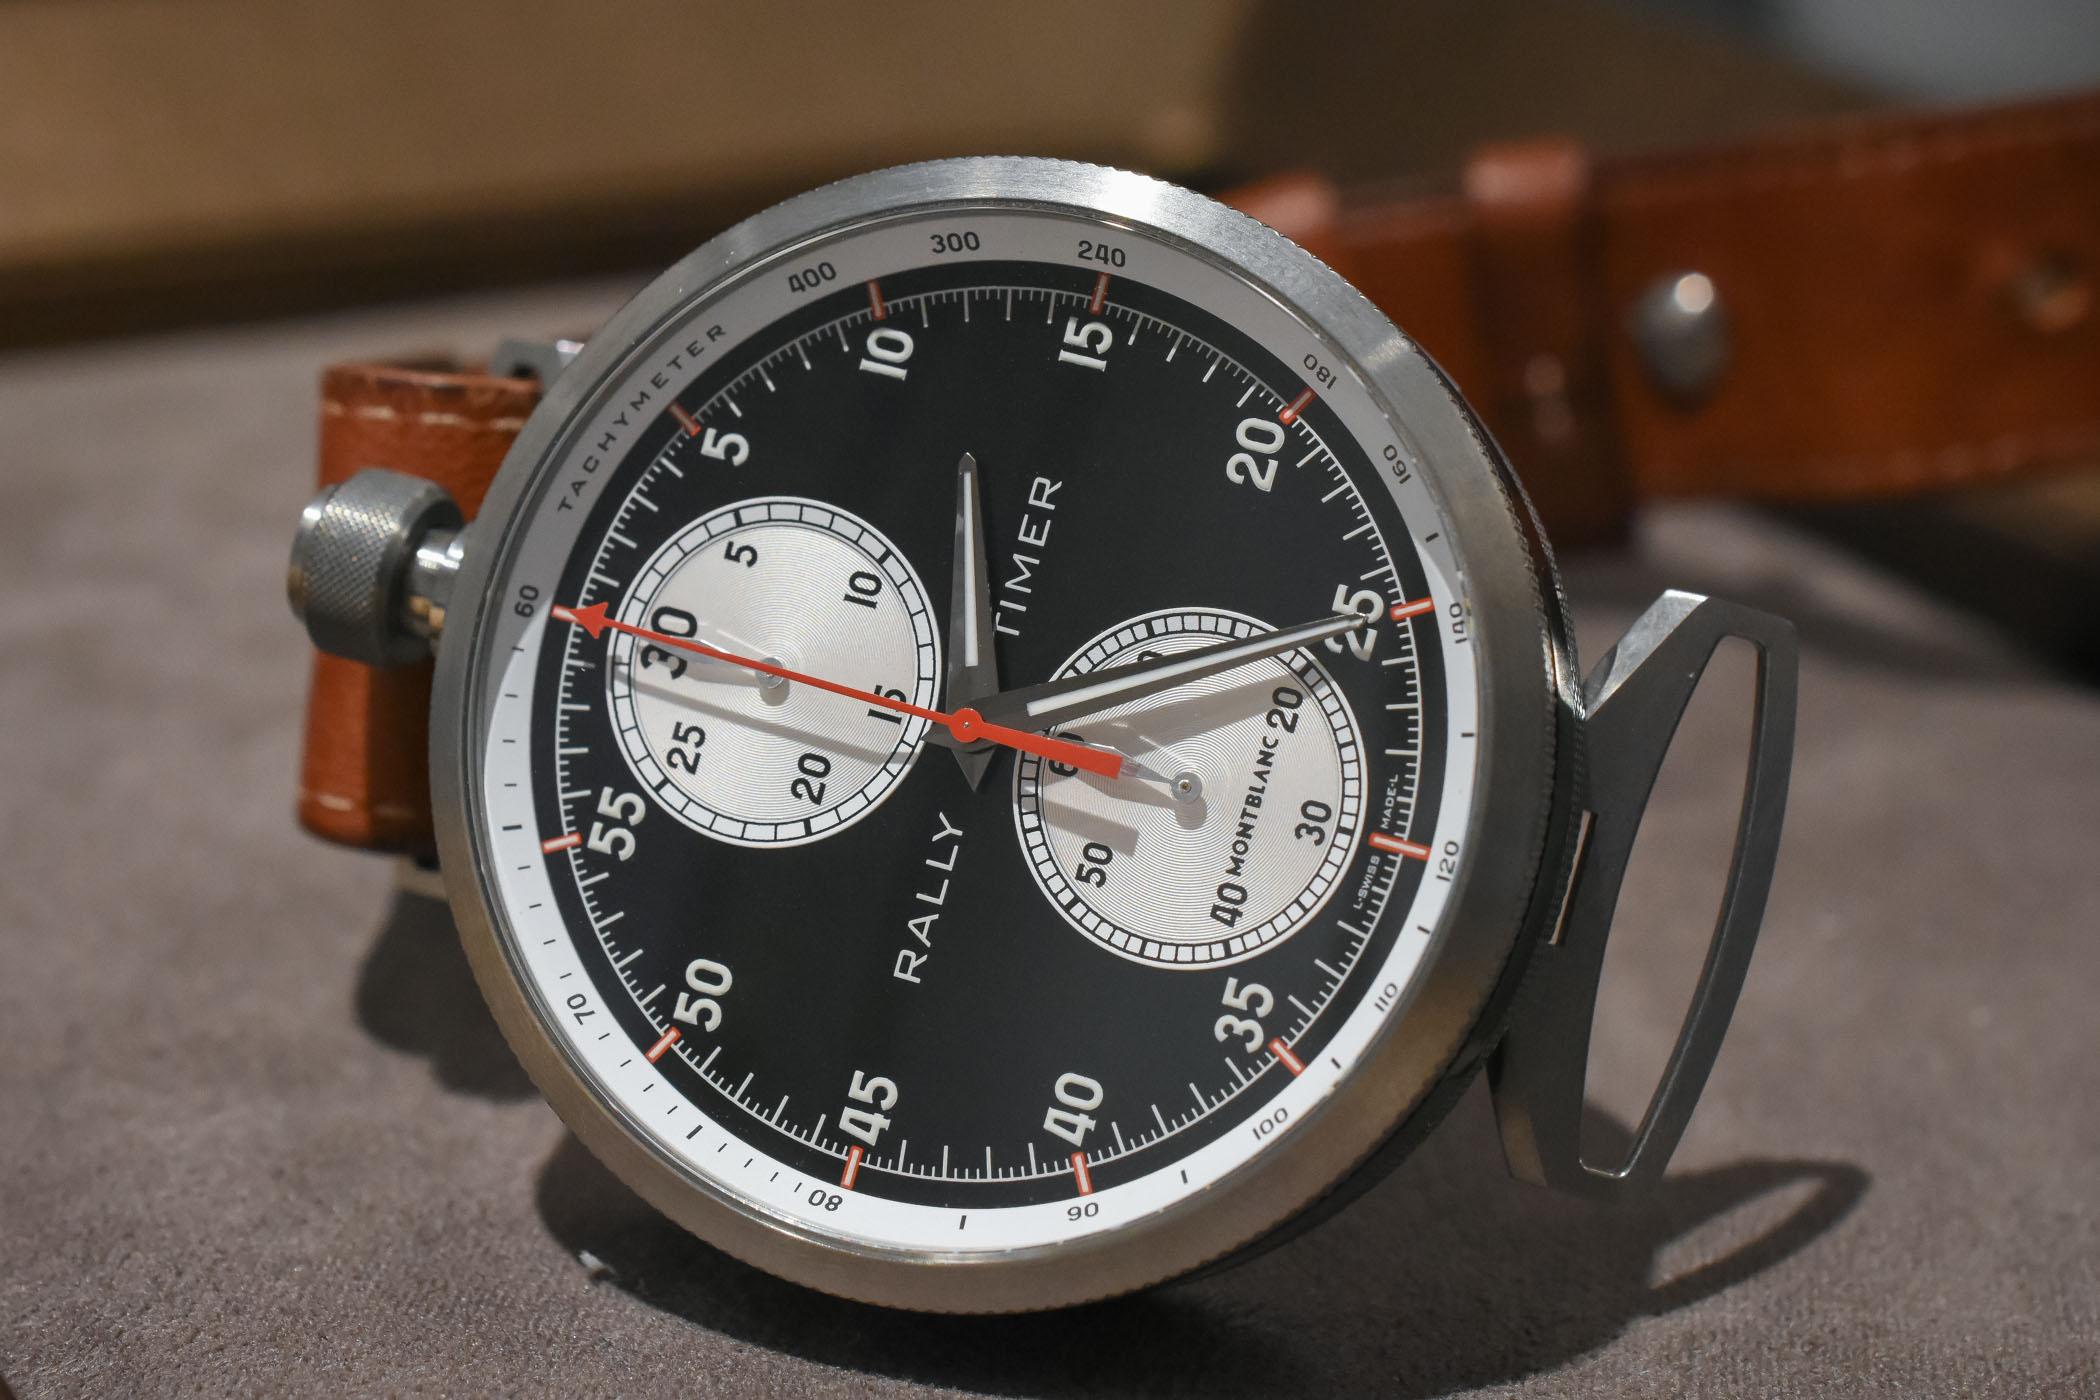 Montblanc TimeWalker Rally Timer Chronograph Reversed Panda SIHH 2018